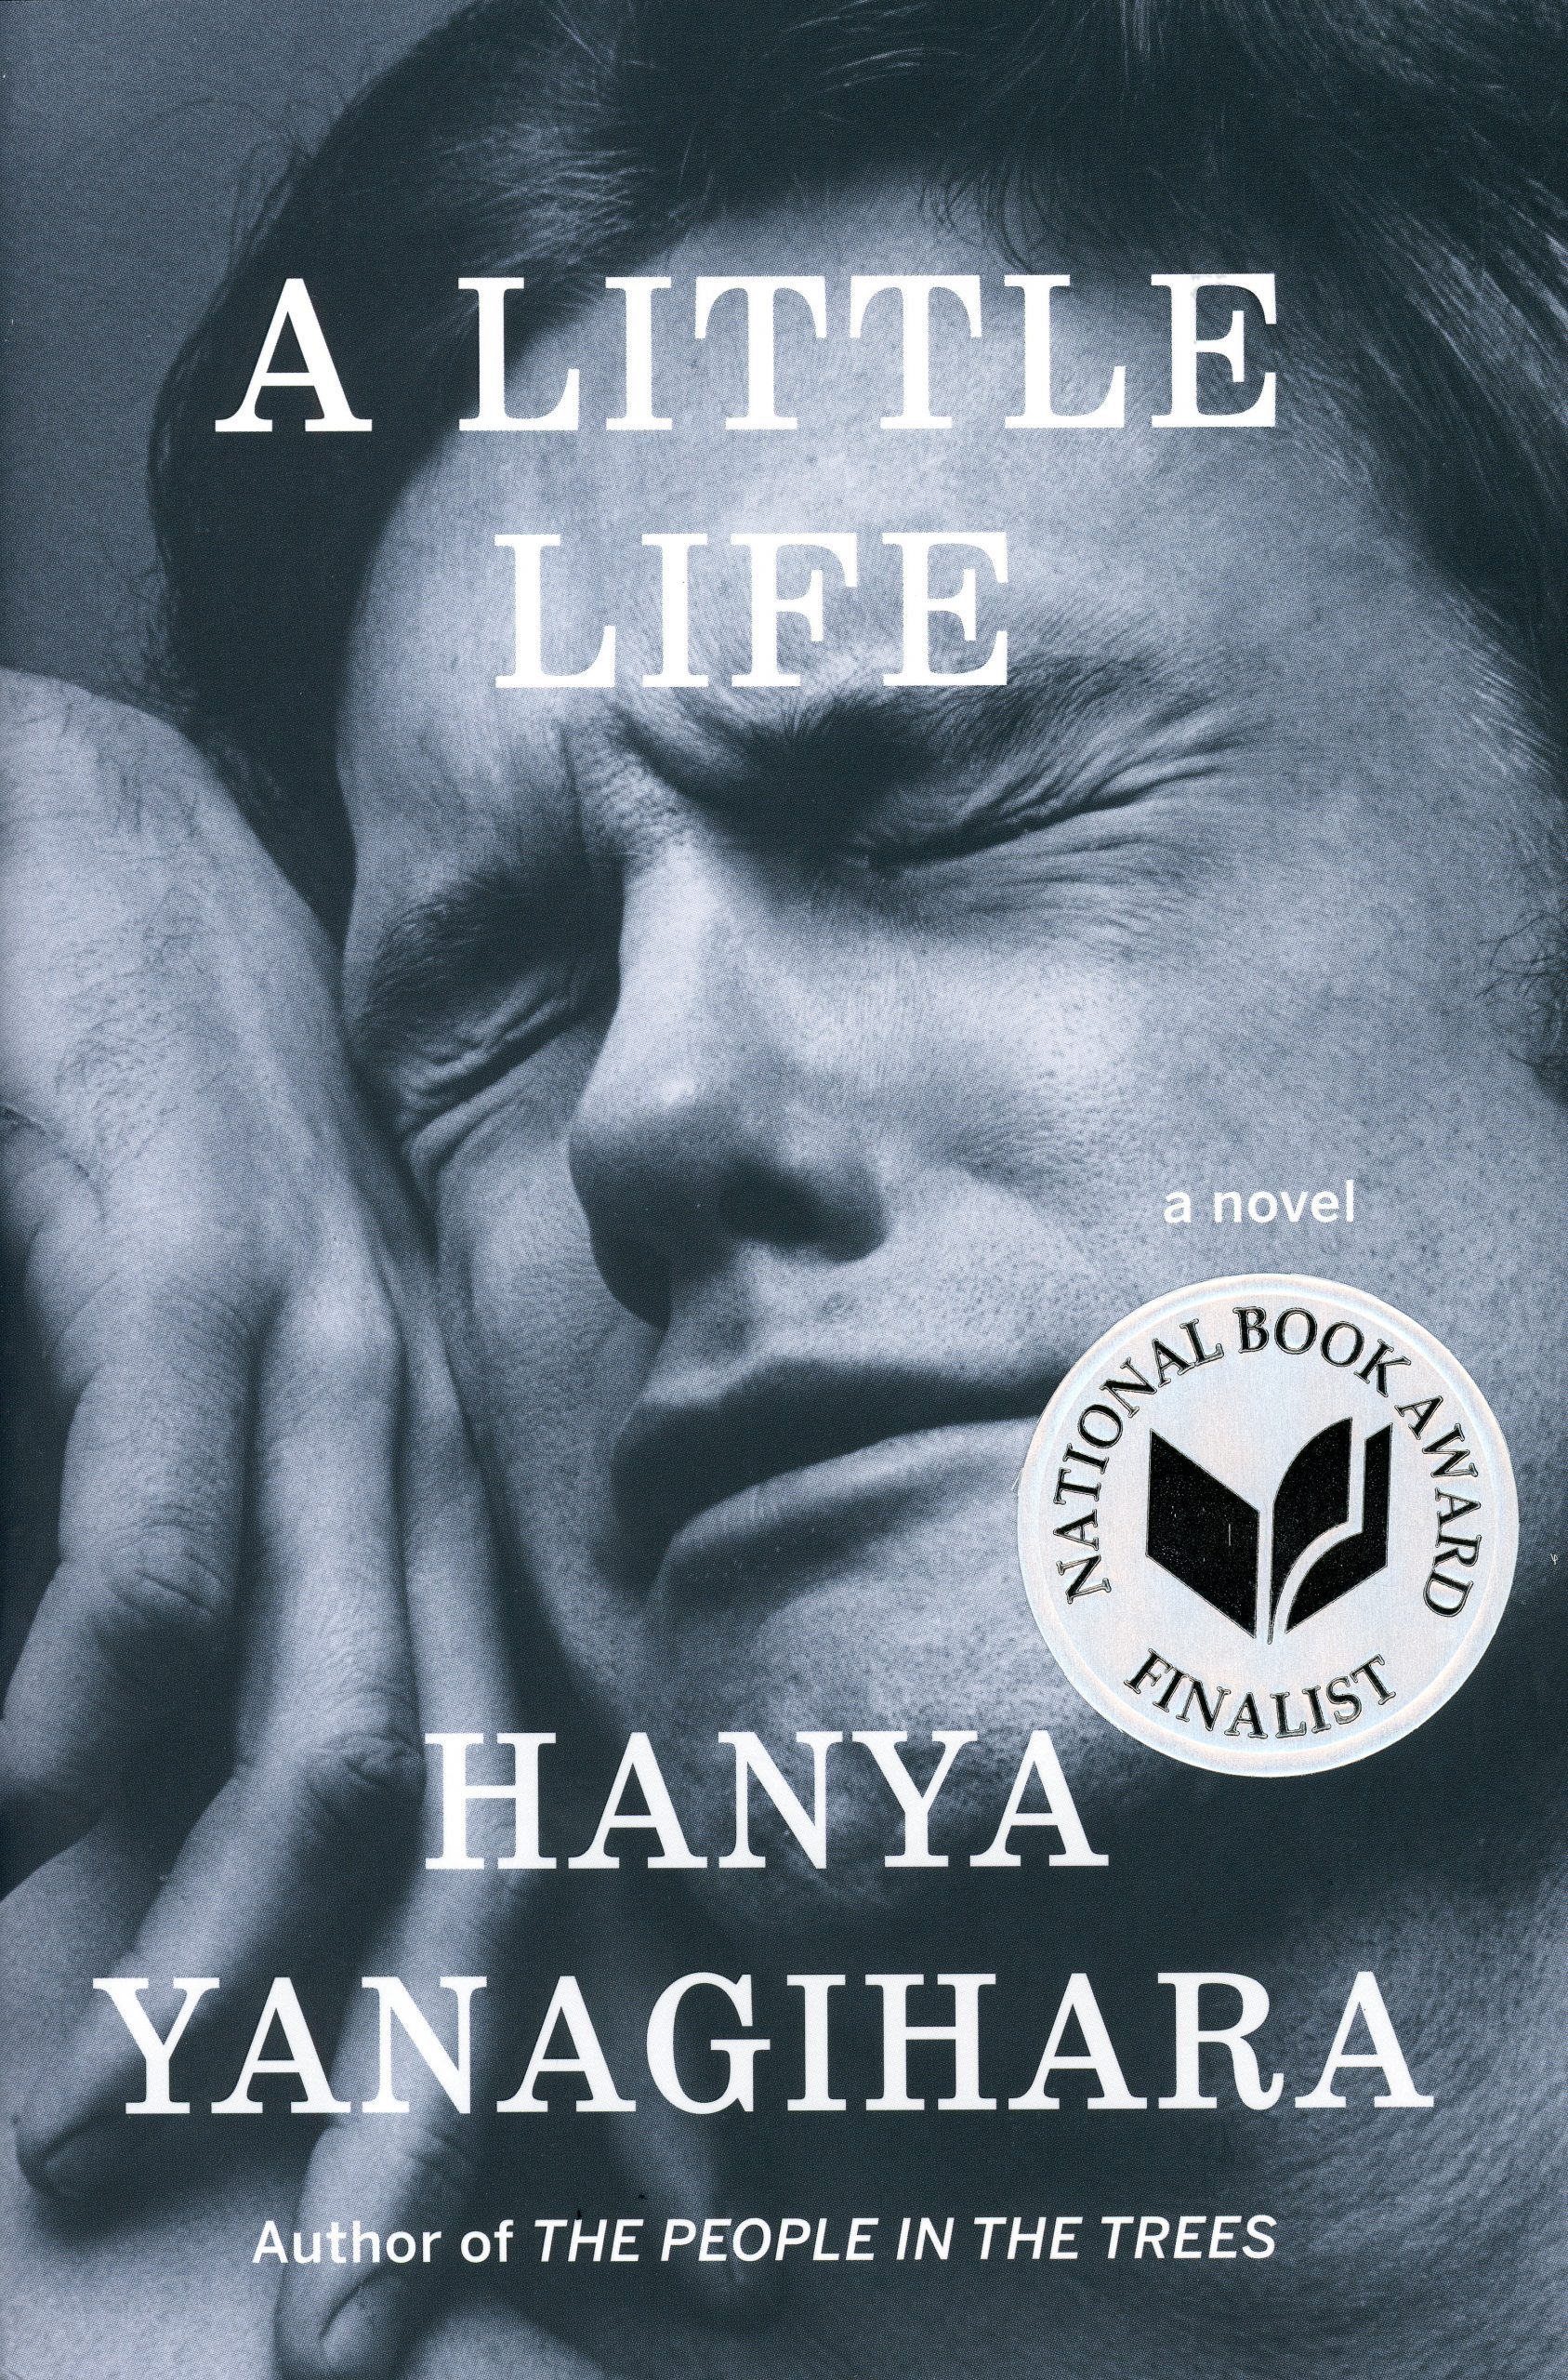 A Little Life by Hanya Yanagihara book cover, 2015